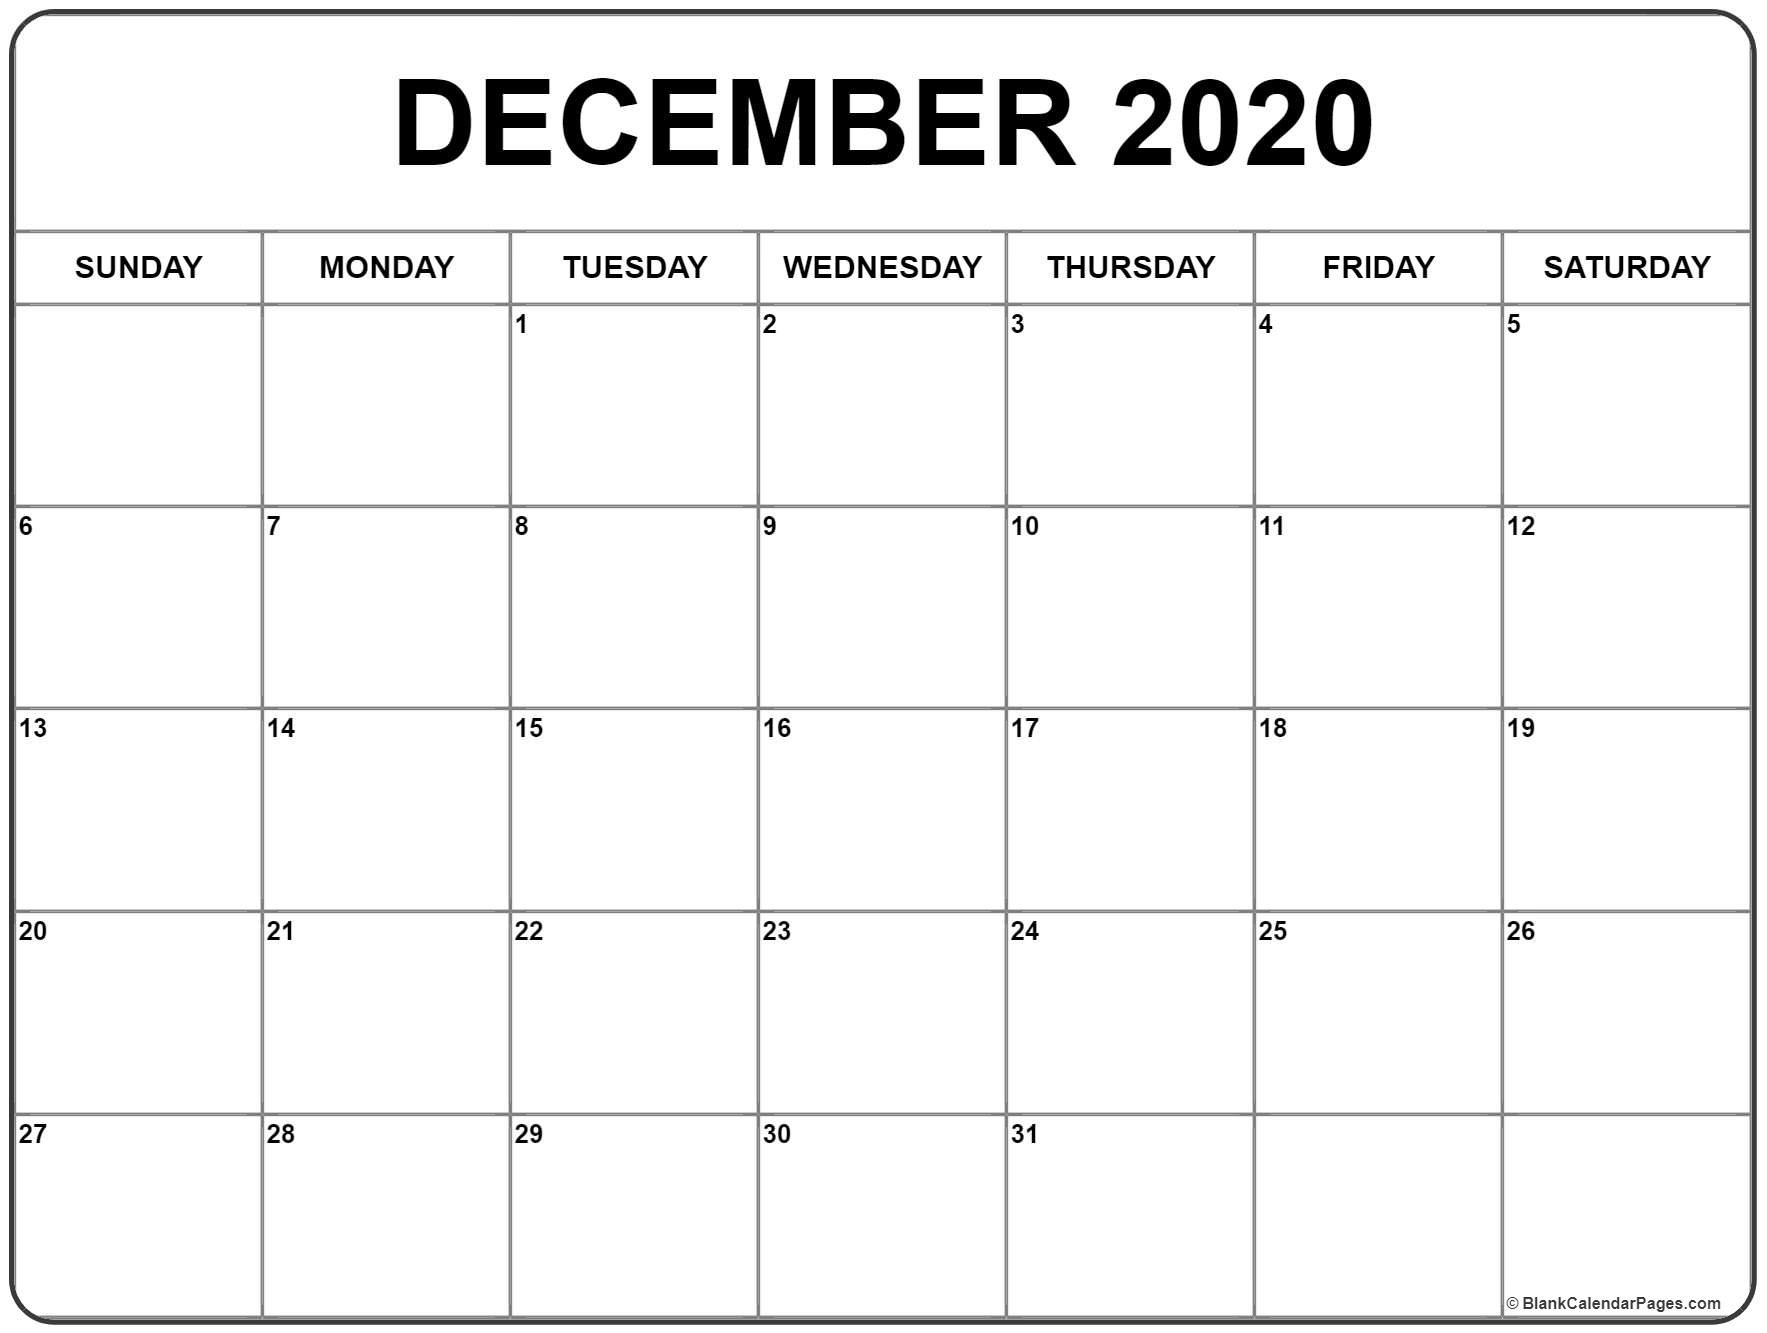 December 2020 Calendar | Free Printable Monthly Calendars-Printable Calendar 2020 Monthly Bills